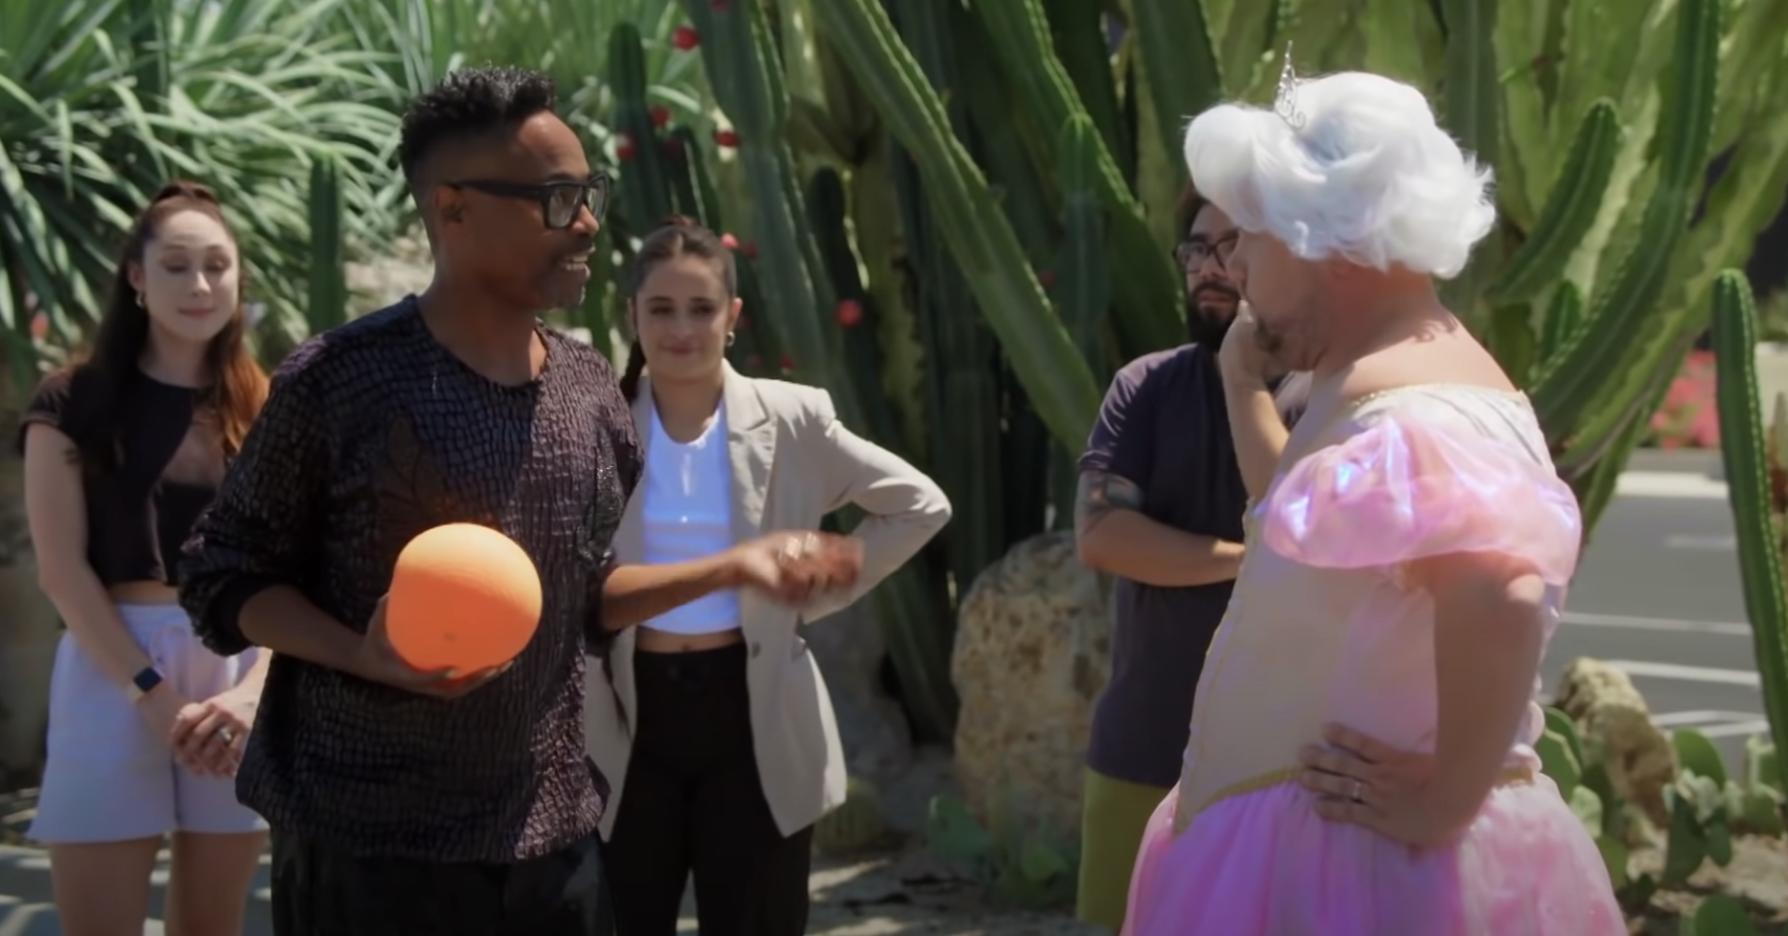 Billy talks to James as Cinderella